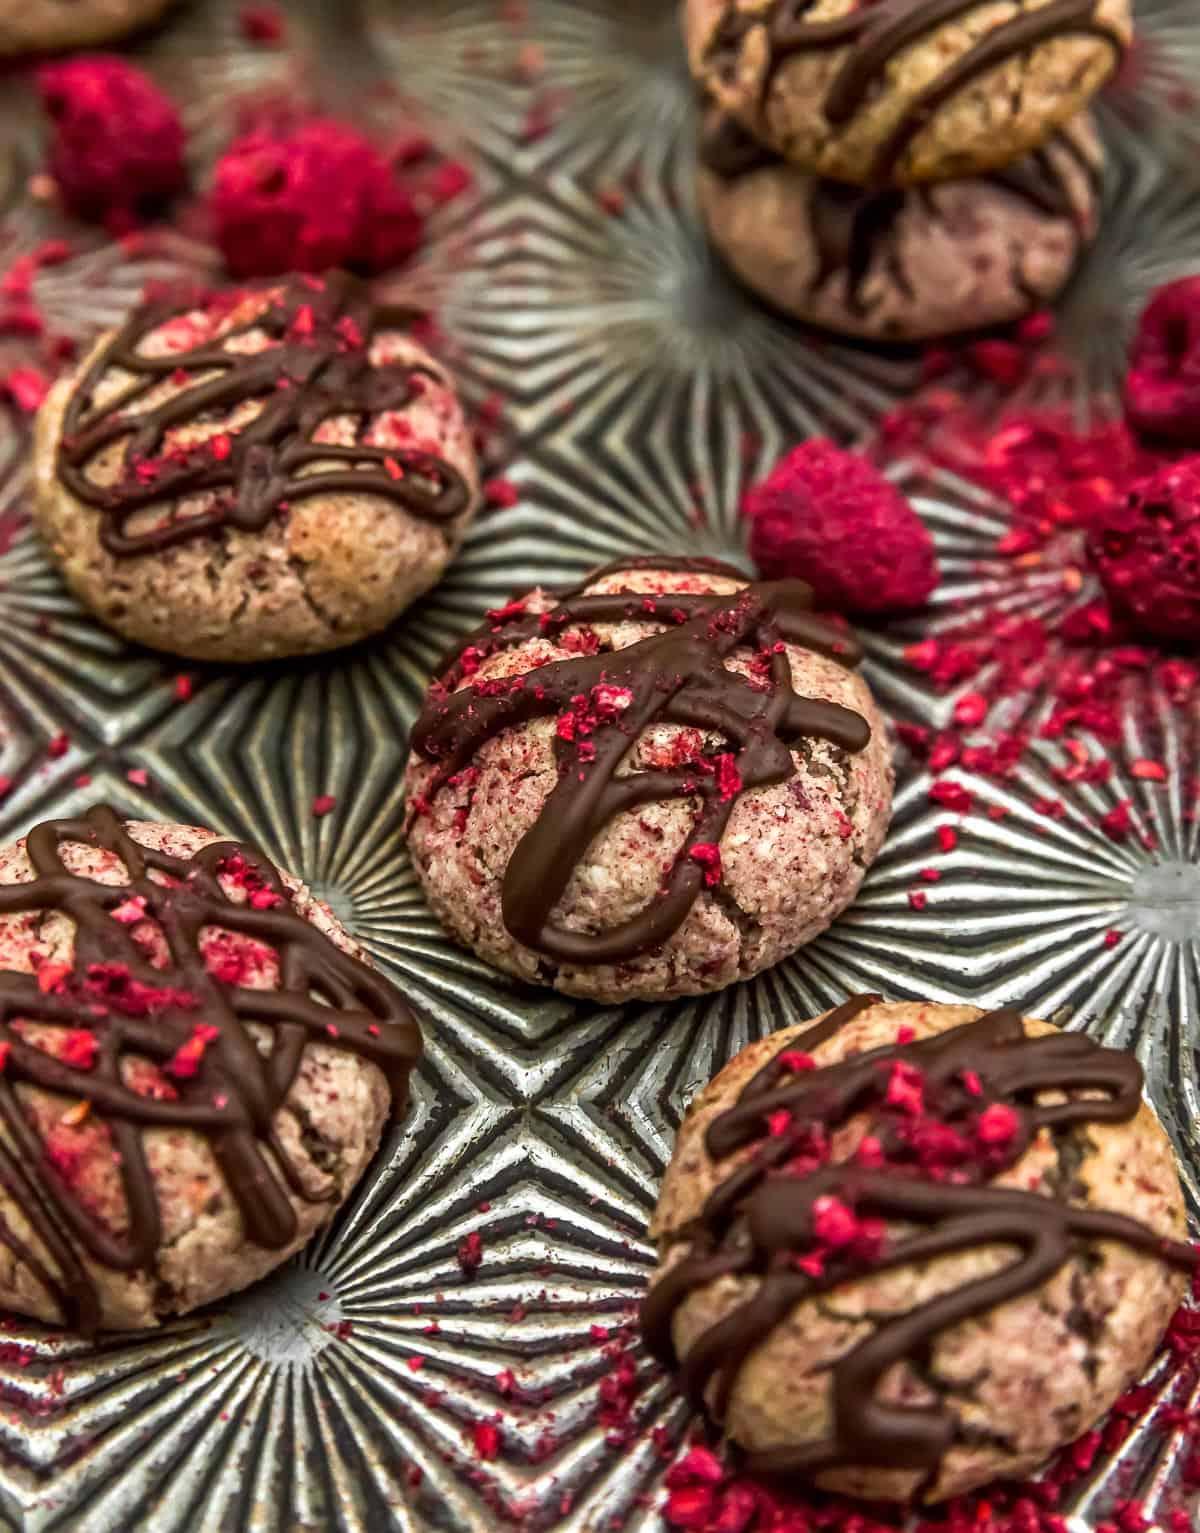 Tray of Vegan Chocolate Raspberry Cream Cookies